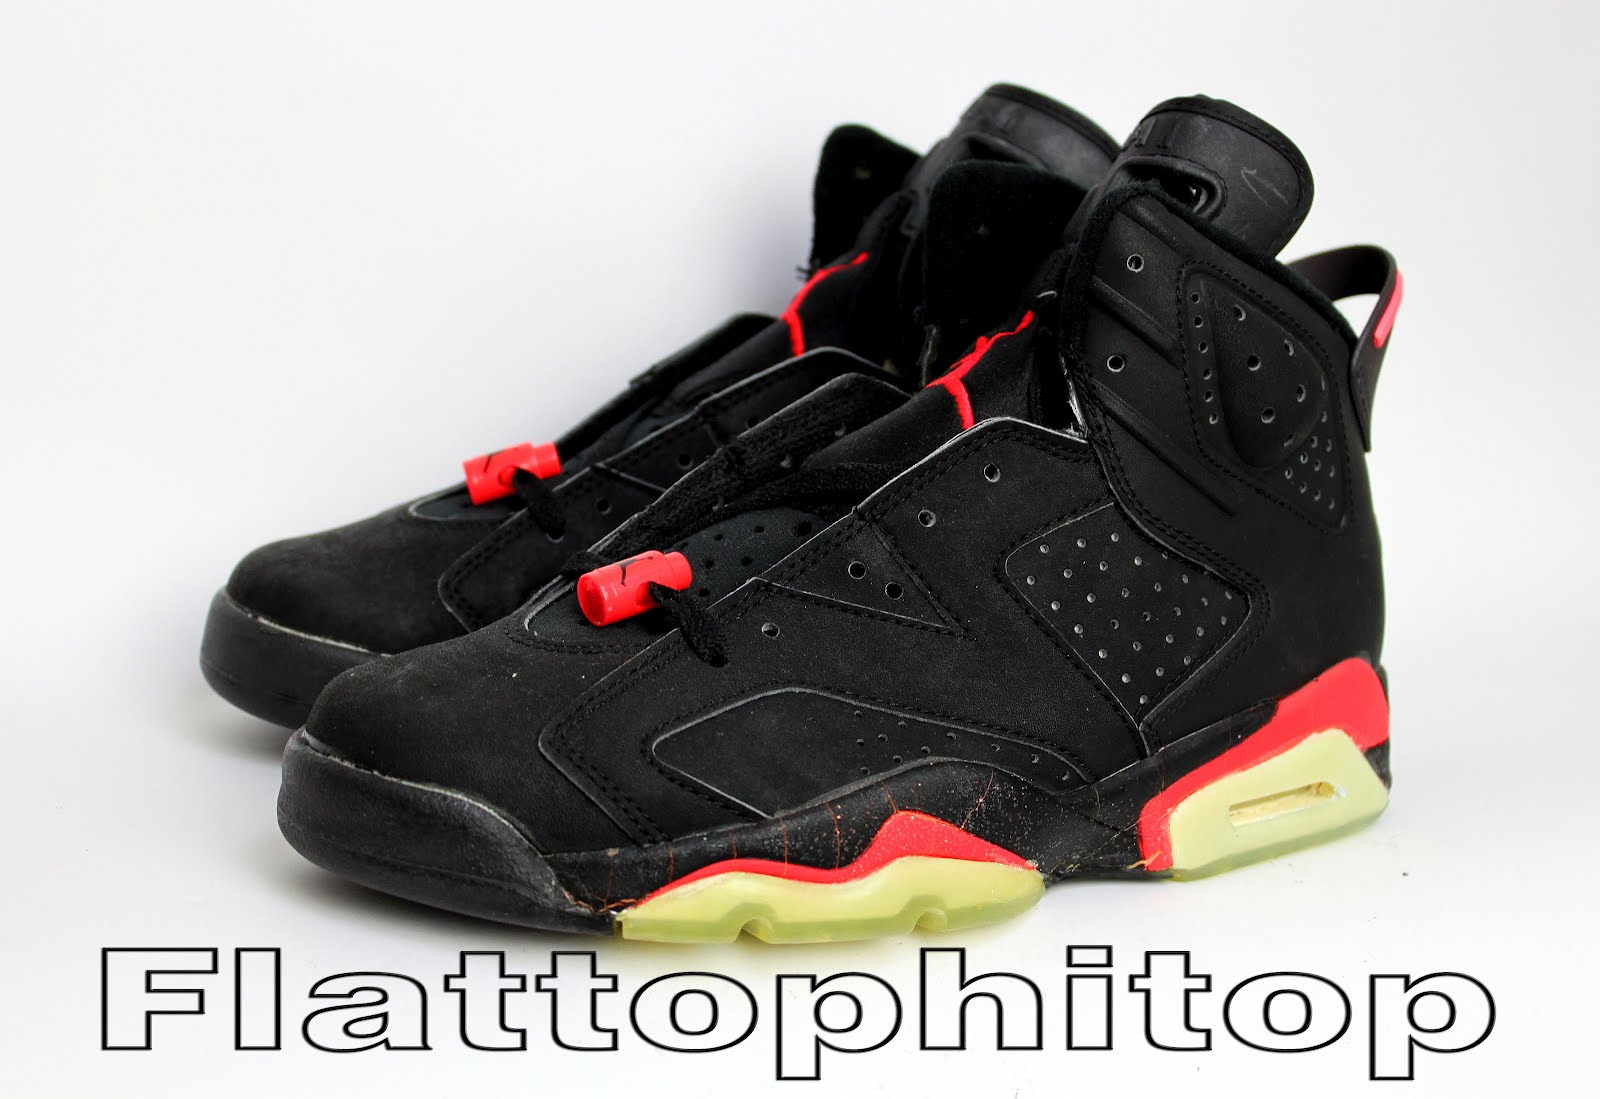 online retailer c2146 df195 I Like the 1991 s quality. Nike please release retro kicks like the OG s.  No more Banana toe.